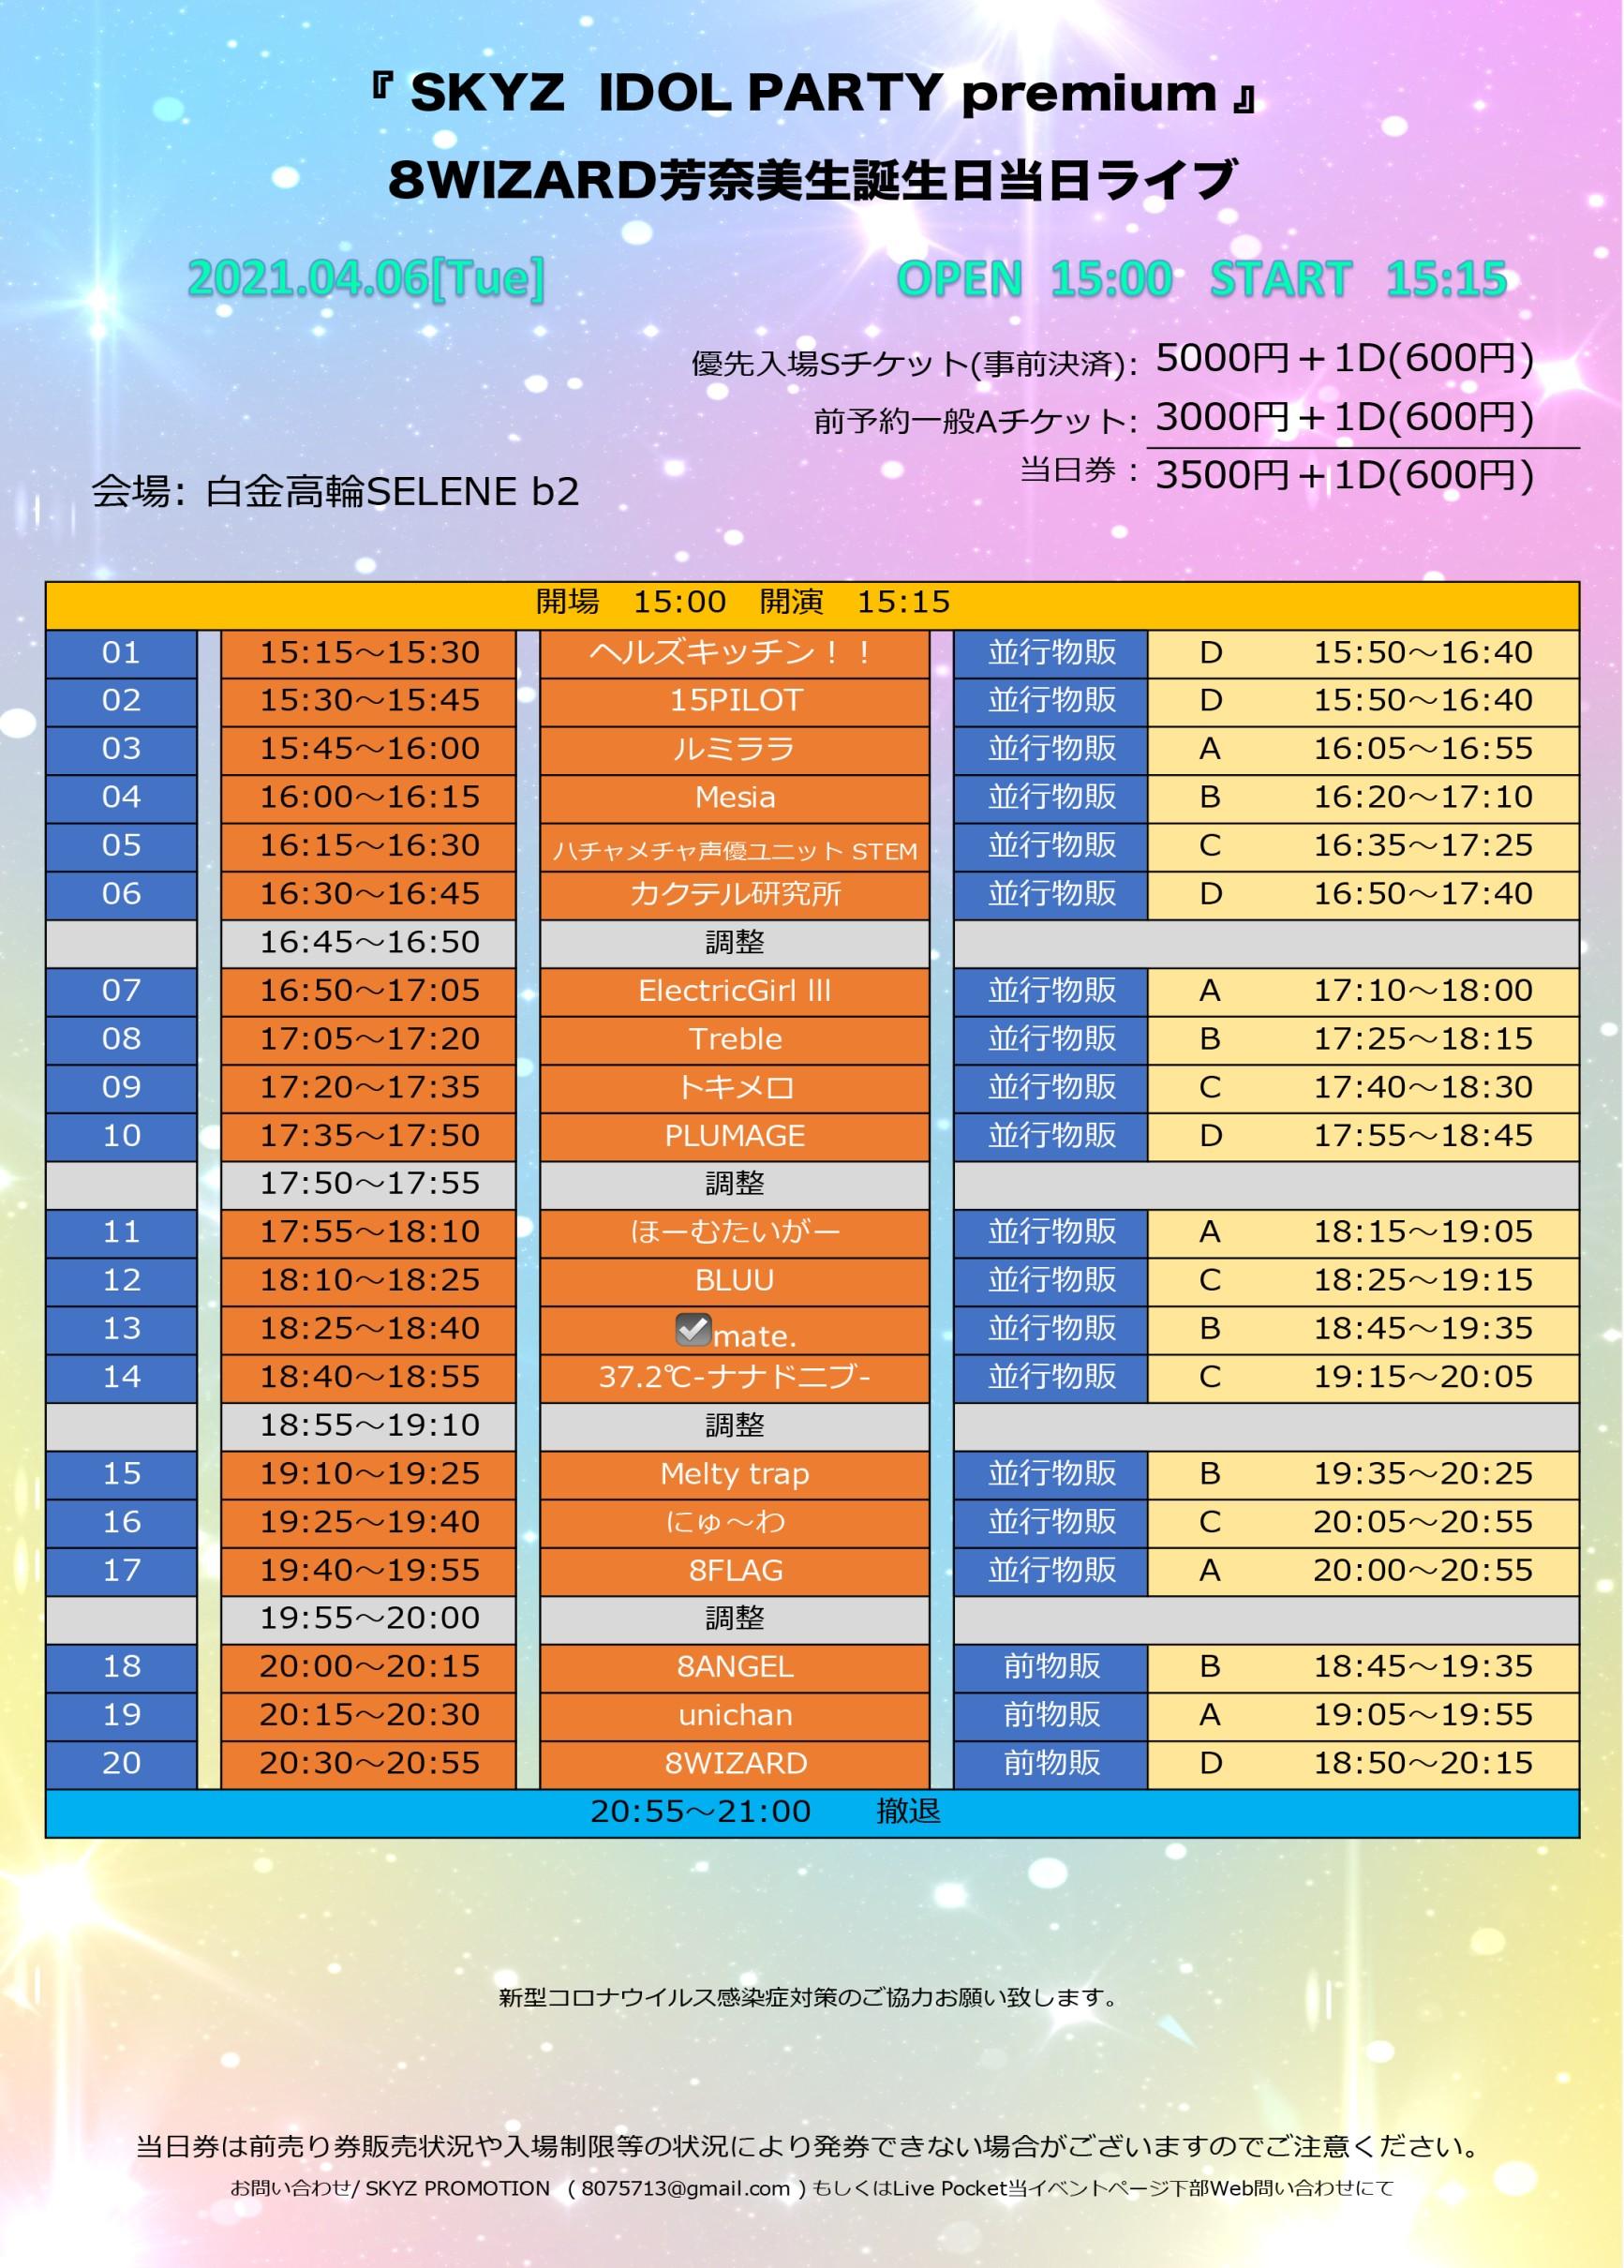 SKYZ IDOL PARTY premium 8WIZARD芳奈美生誕生日当日ライブ